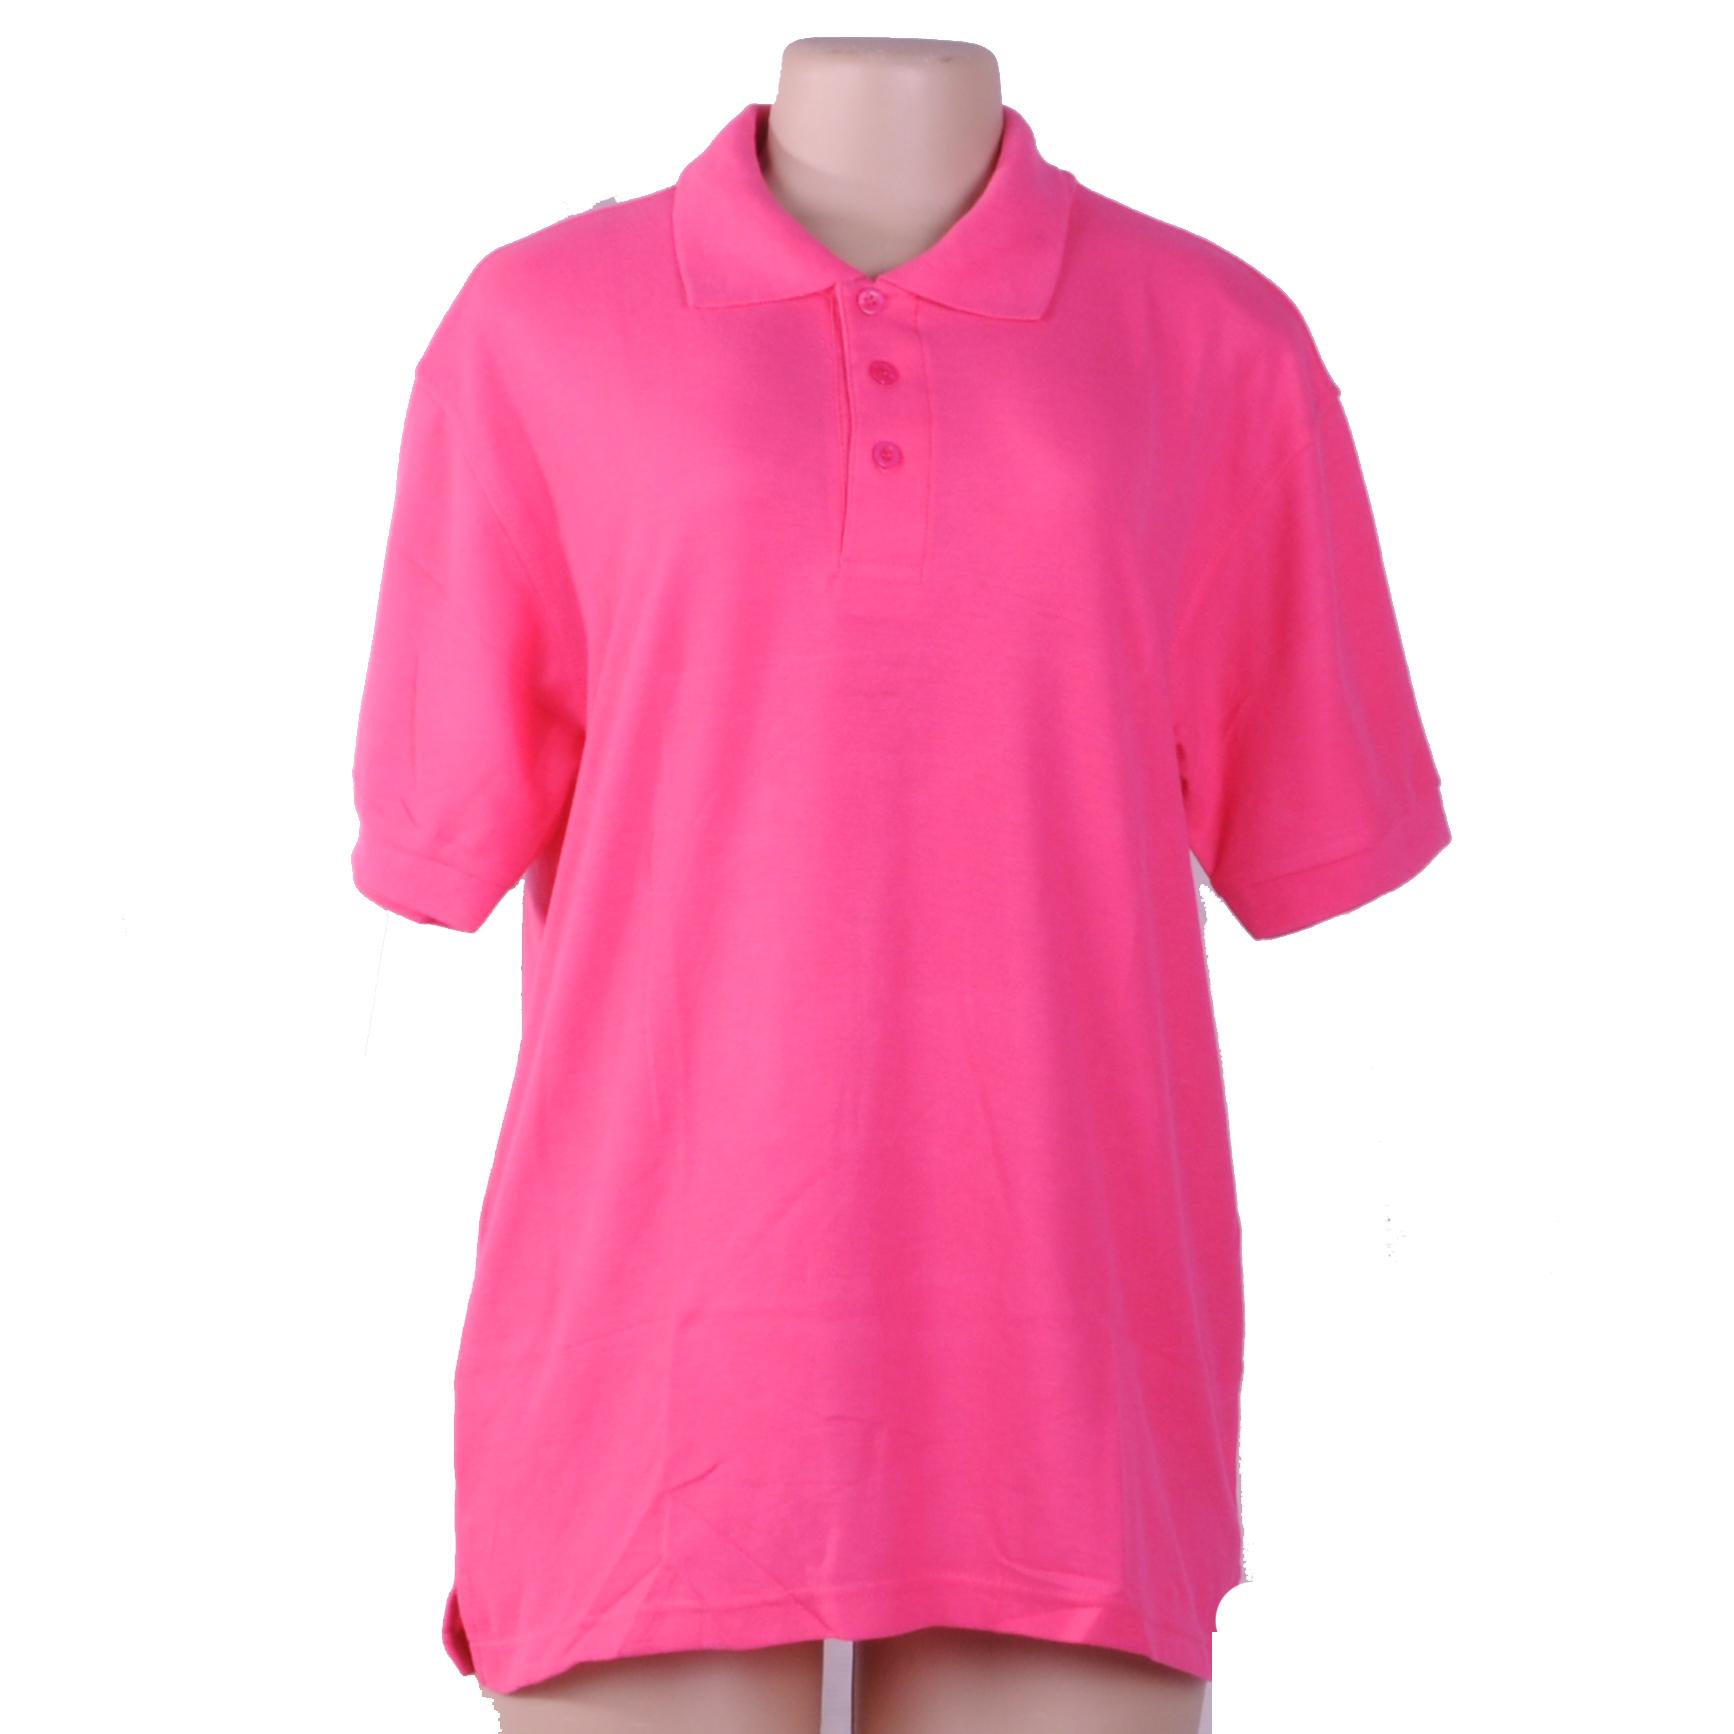 Women 39 s golf shirt sku tc15021801 plus size bulkdeal for Plus size golf polo shirts